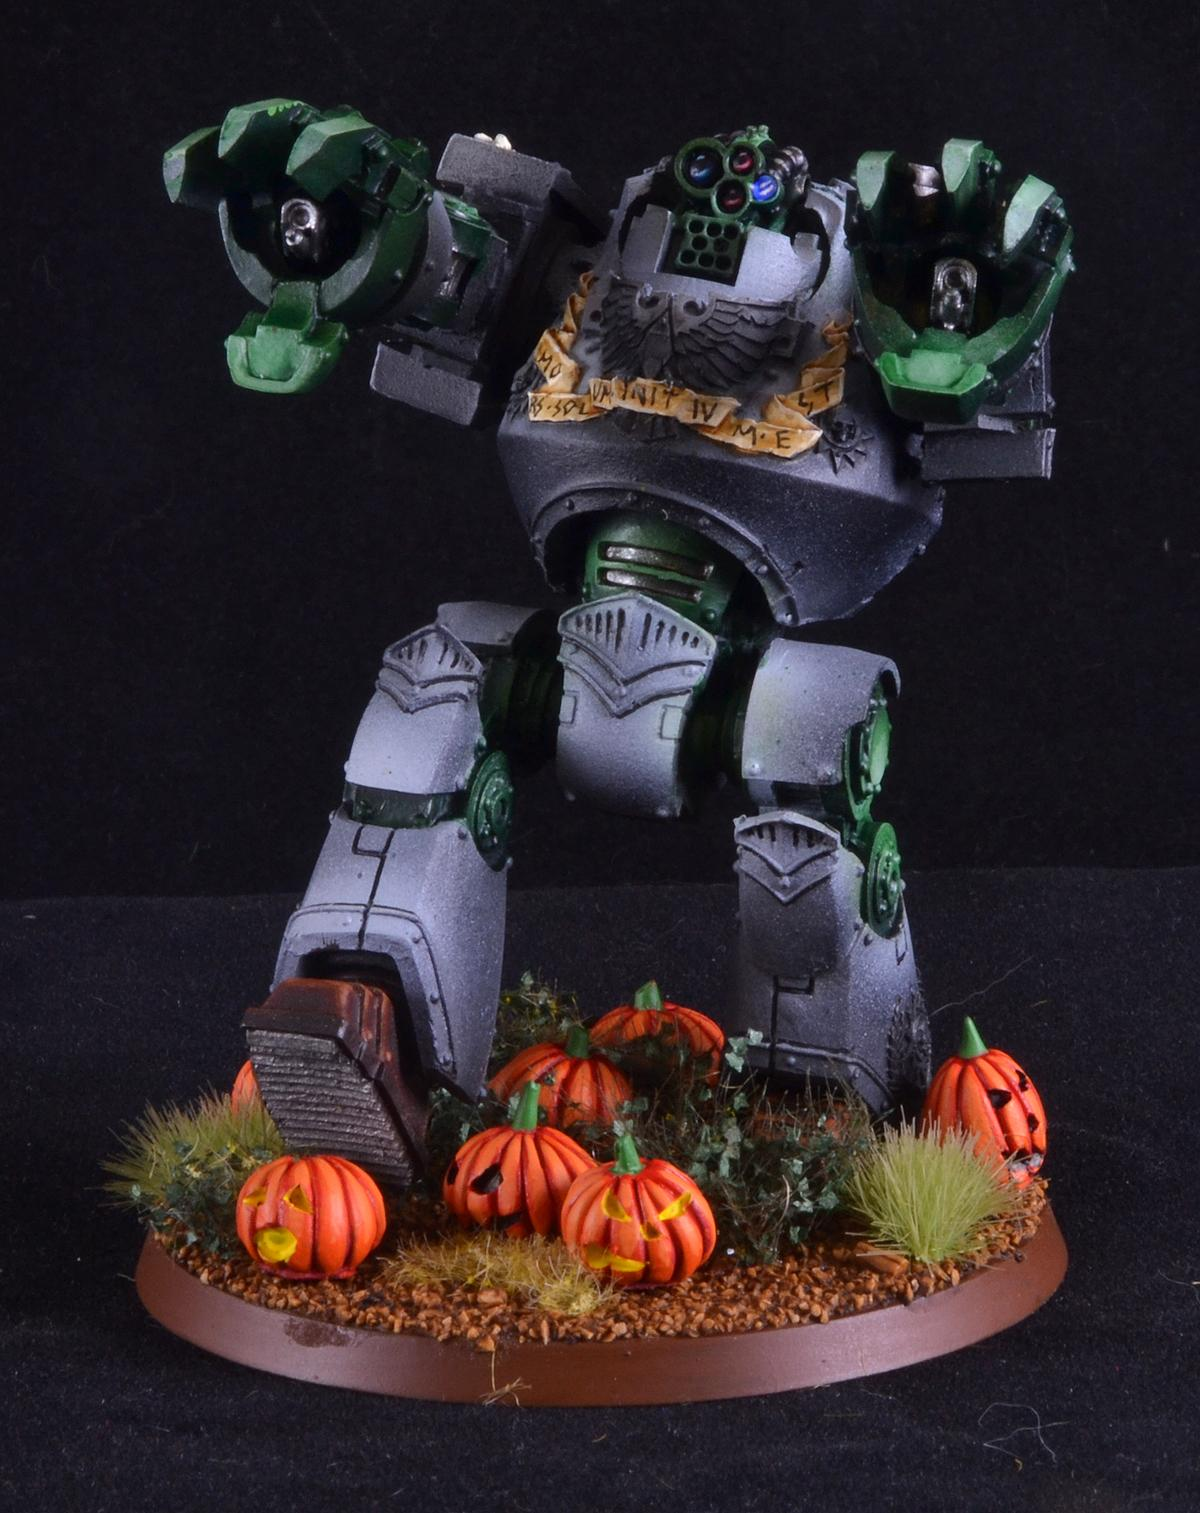 Chaos, Contemptor, Counts As, Frankenstein's Monster, Halloween, Pumpkin, Warhammer 40,000